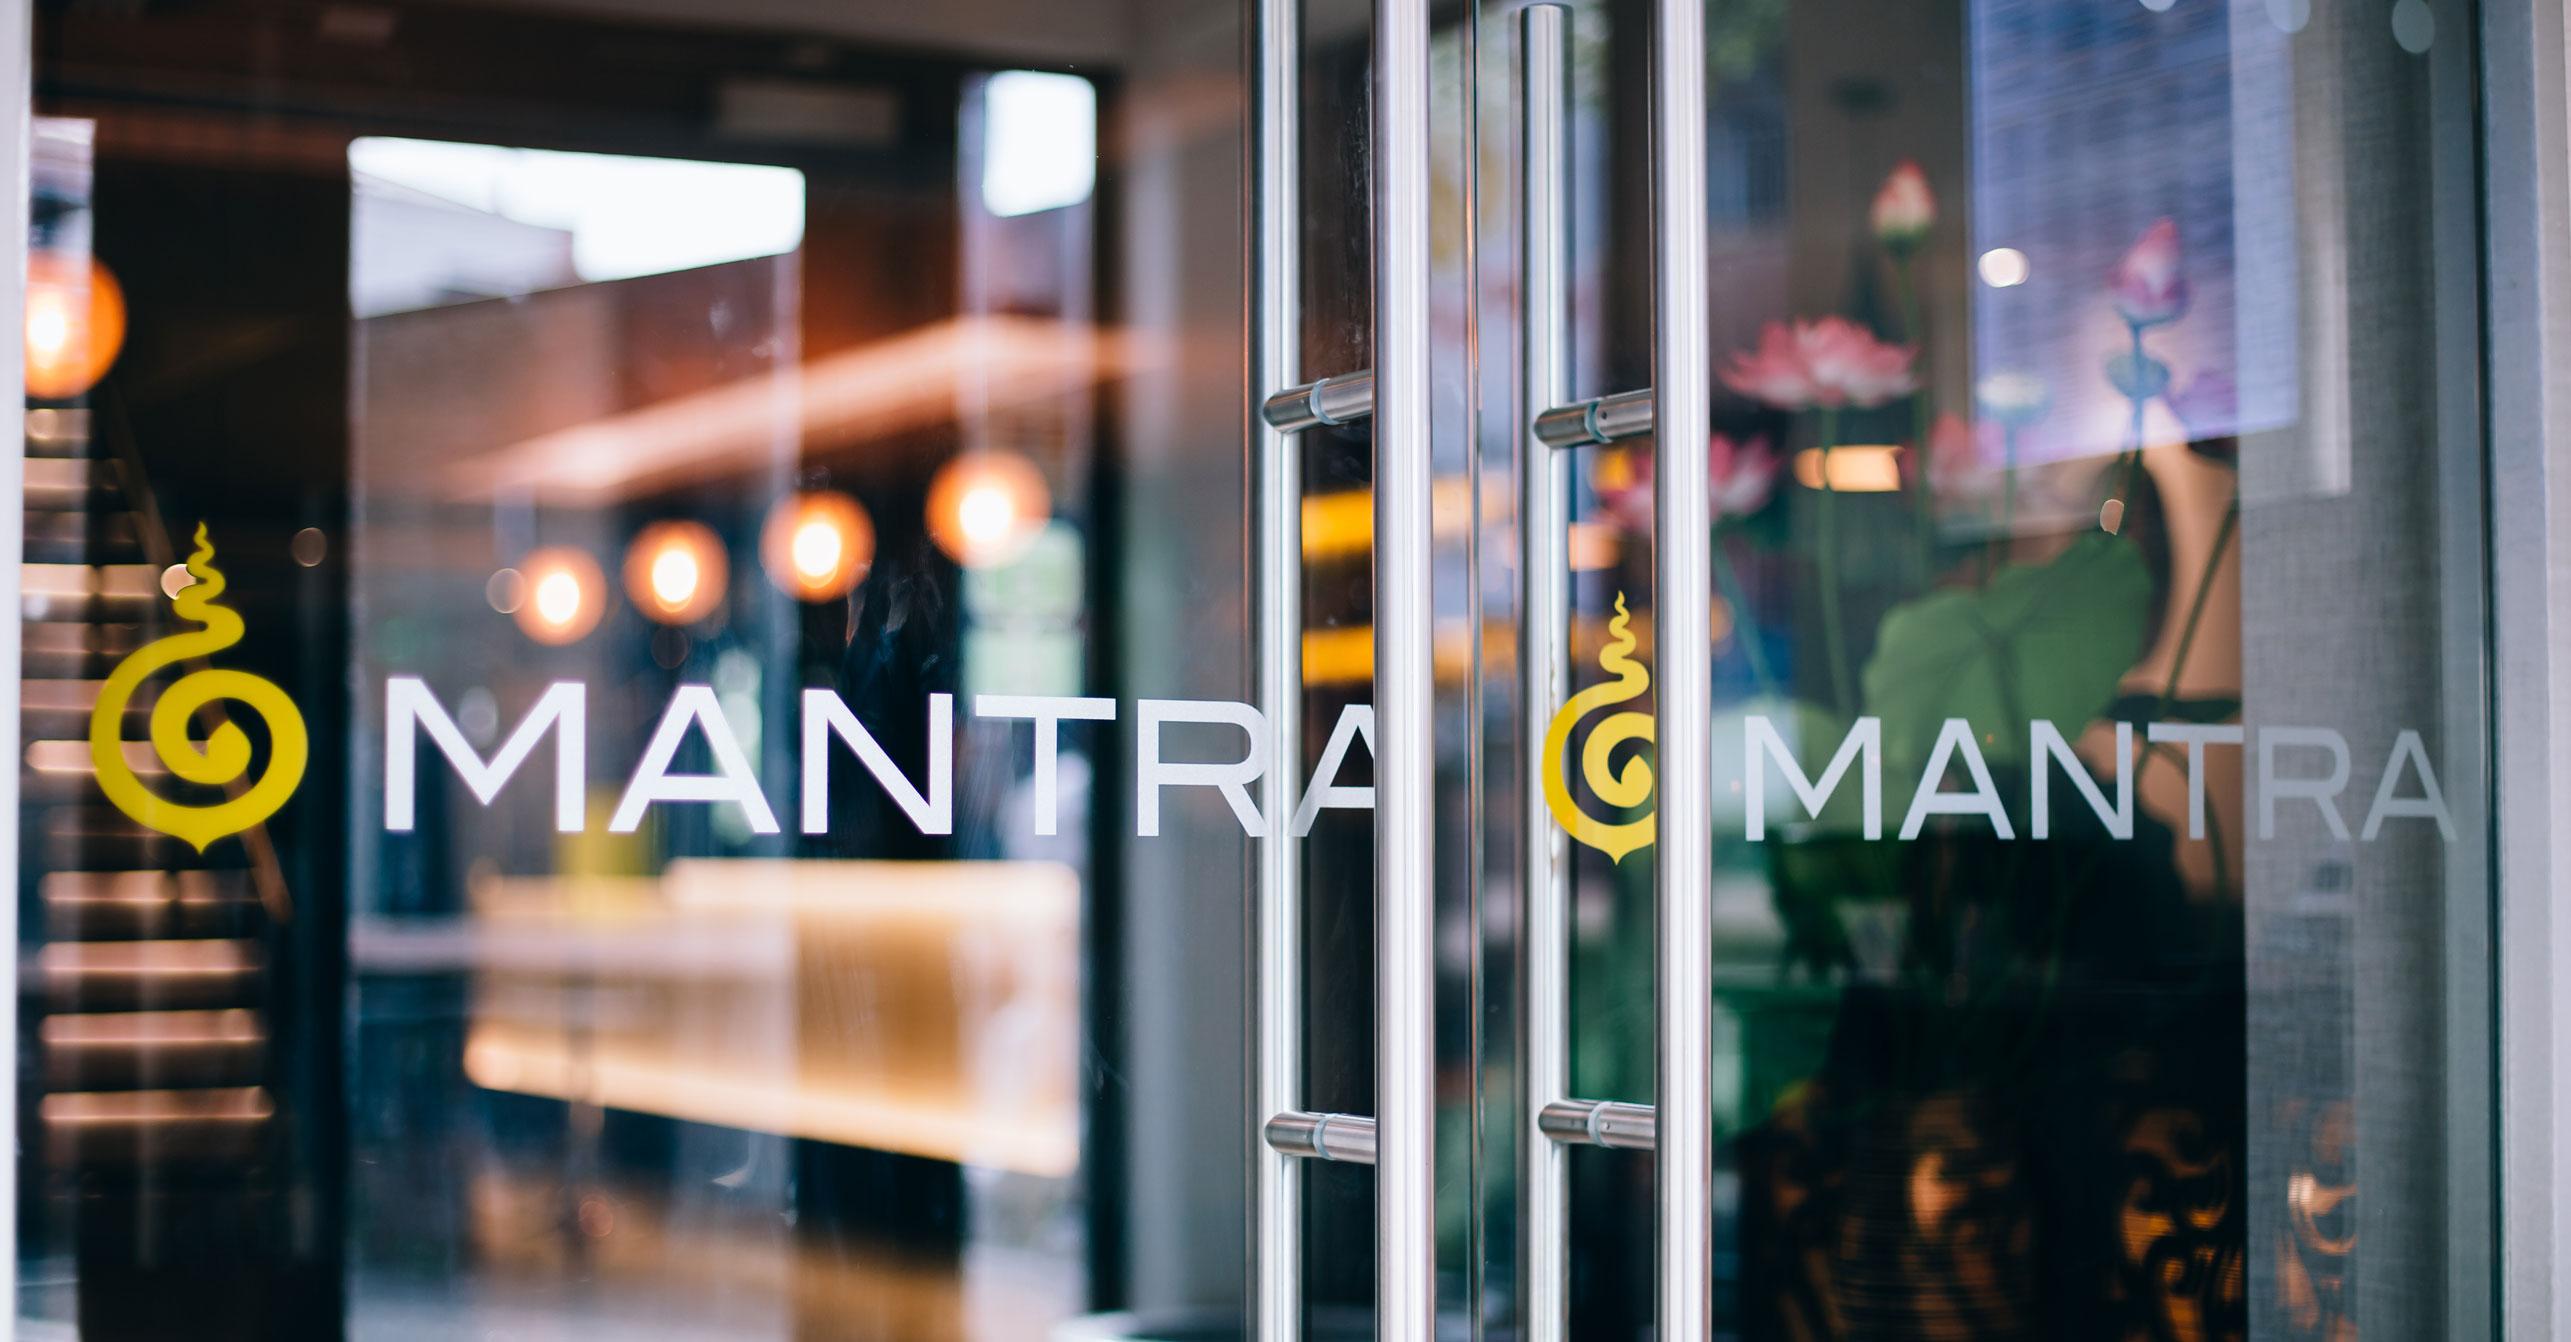 mantra brand window